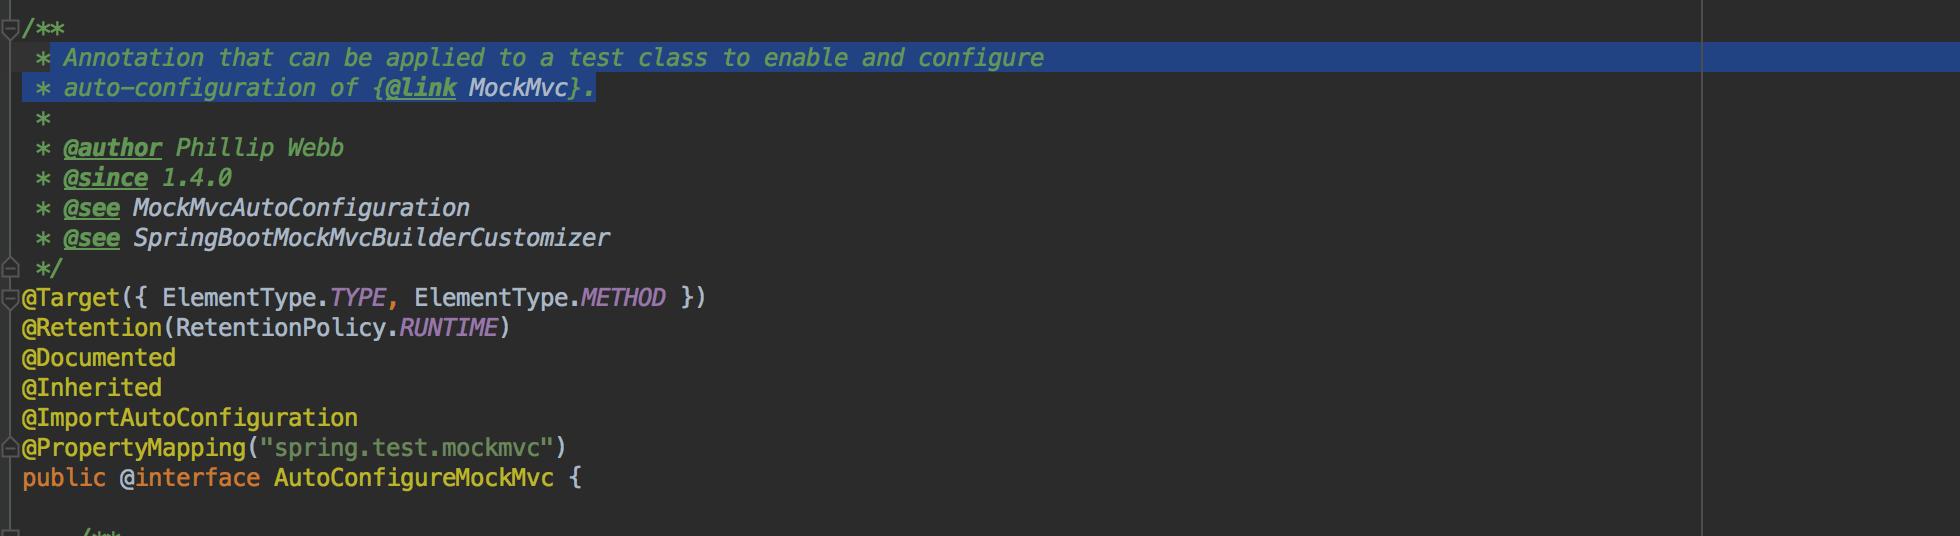 AutoConfigureMockMvc注解